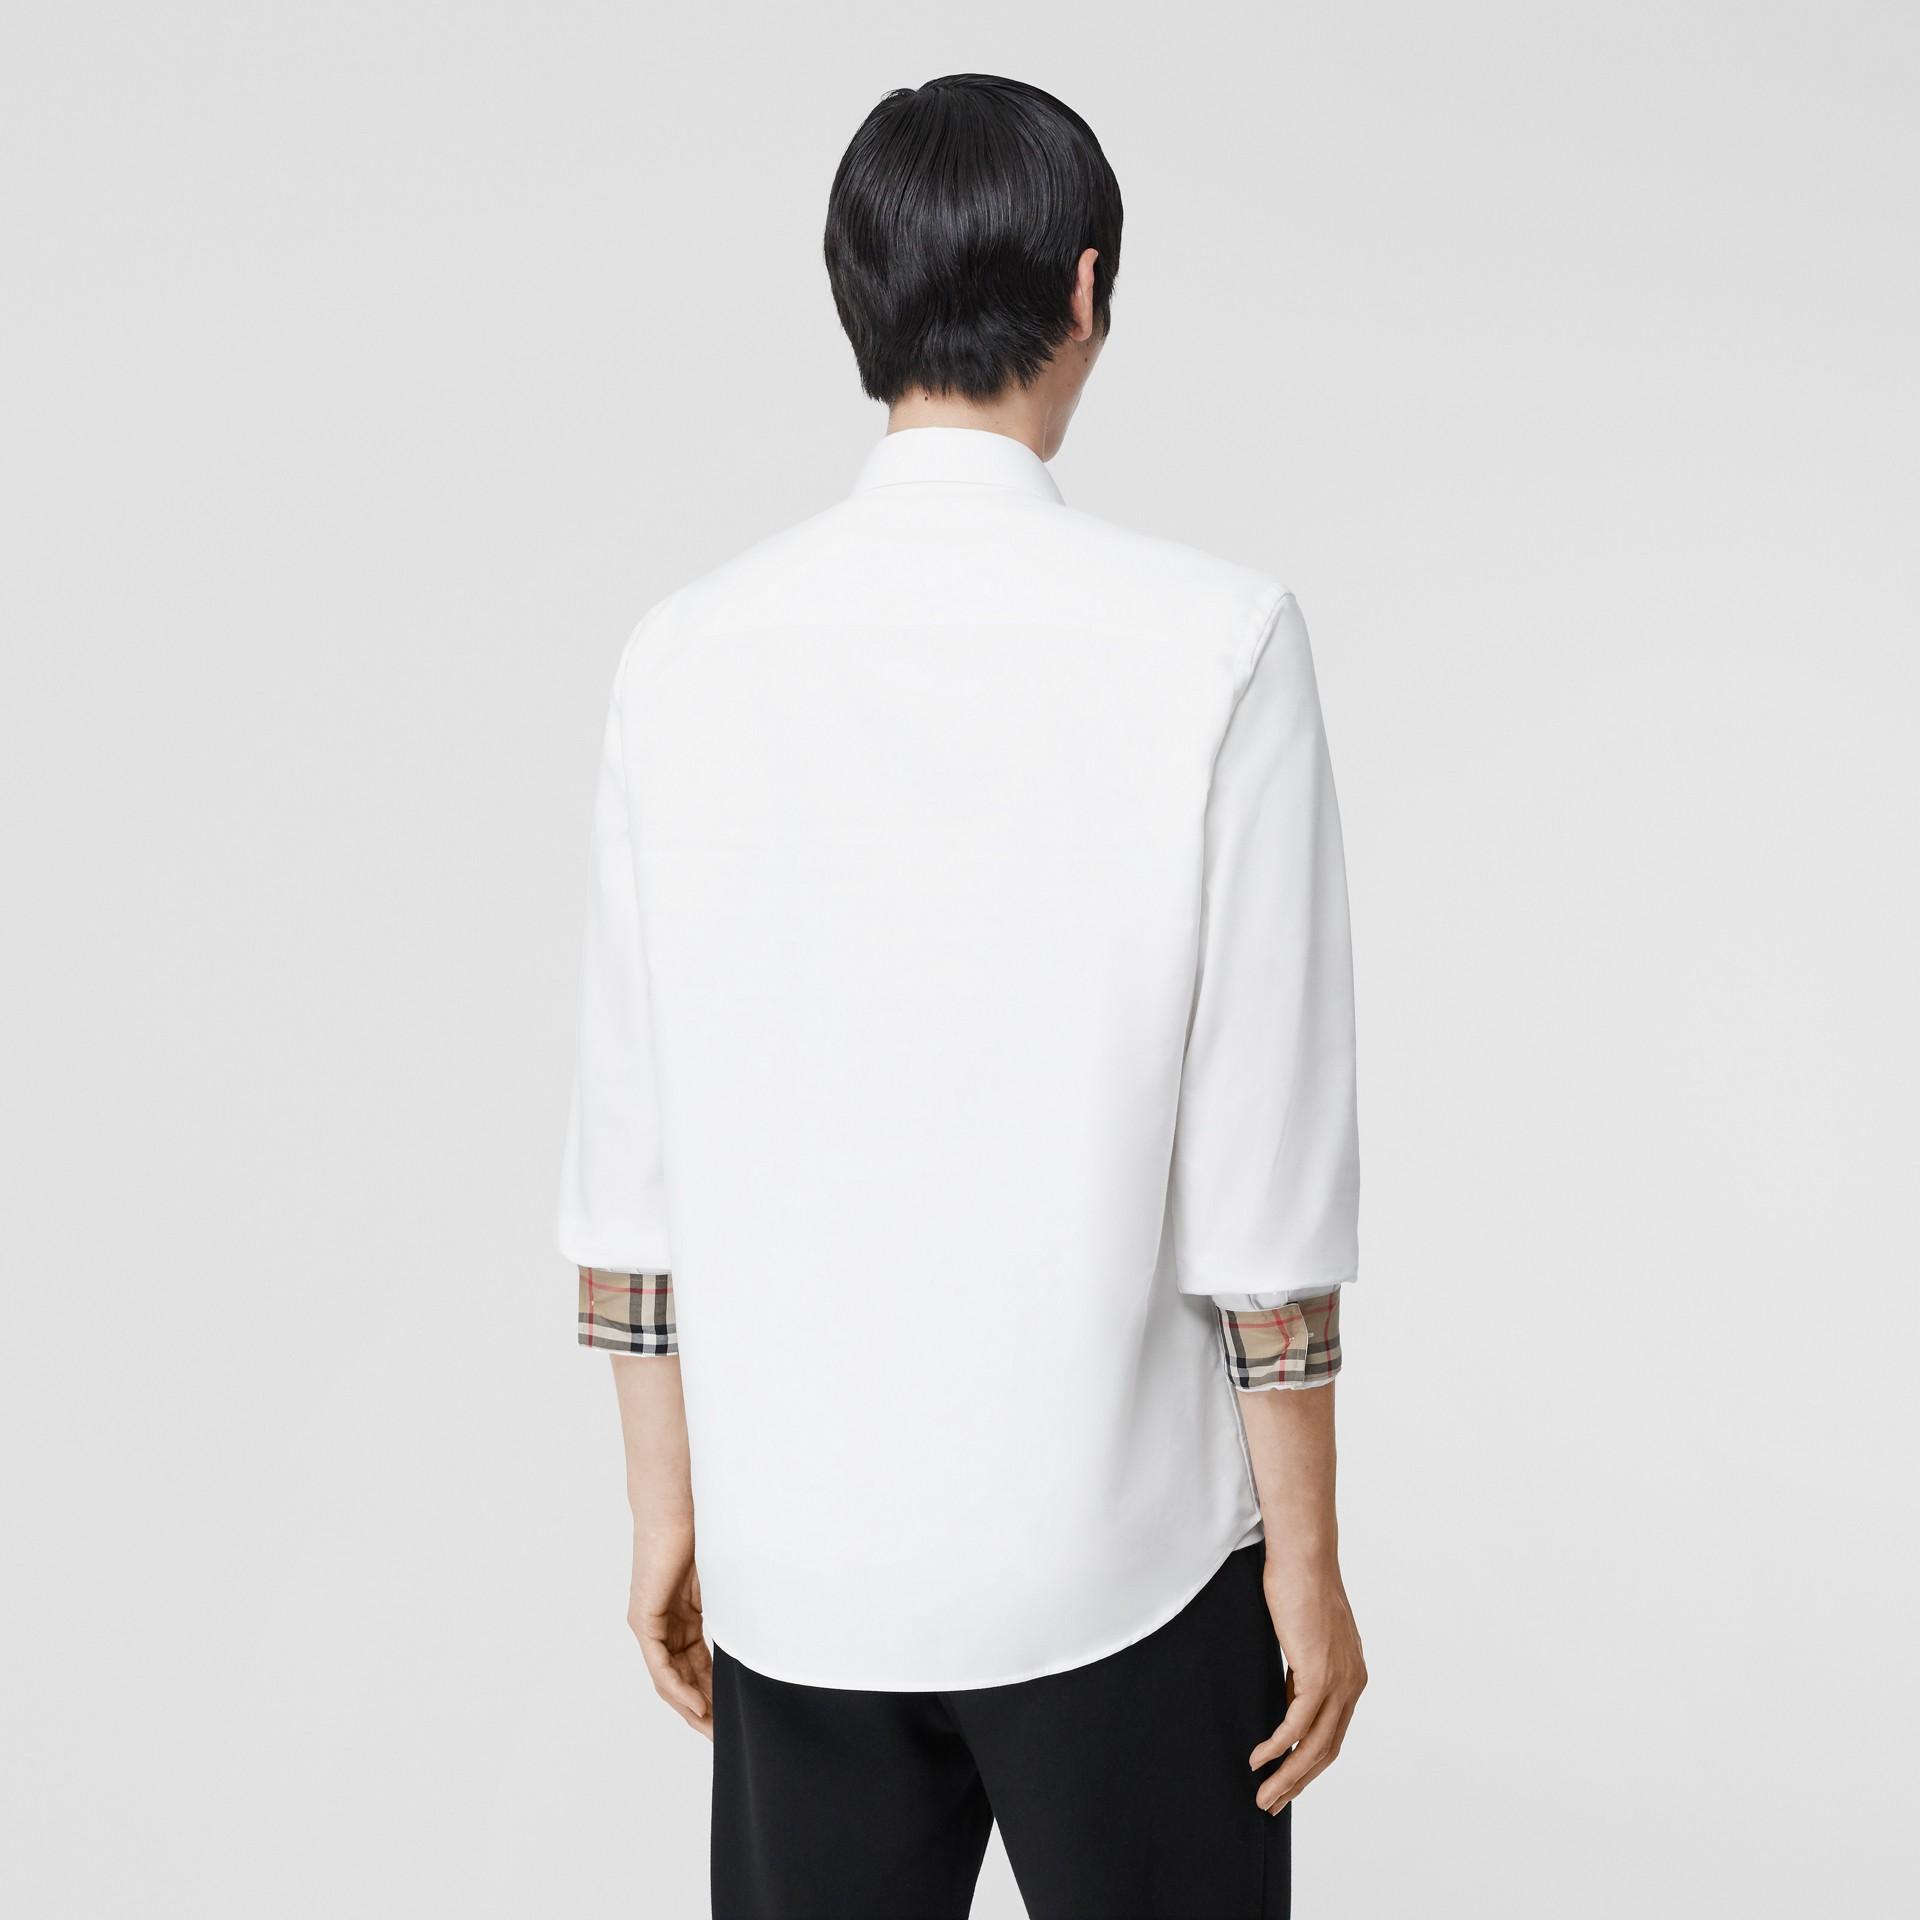 Monogram Motif Cotton Oxford Shirt in White - Men | Burberry Hong Kong S.A.R - gallery image 2